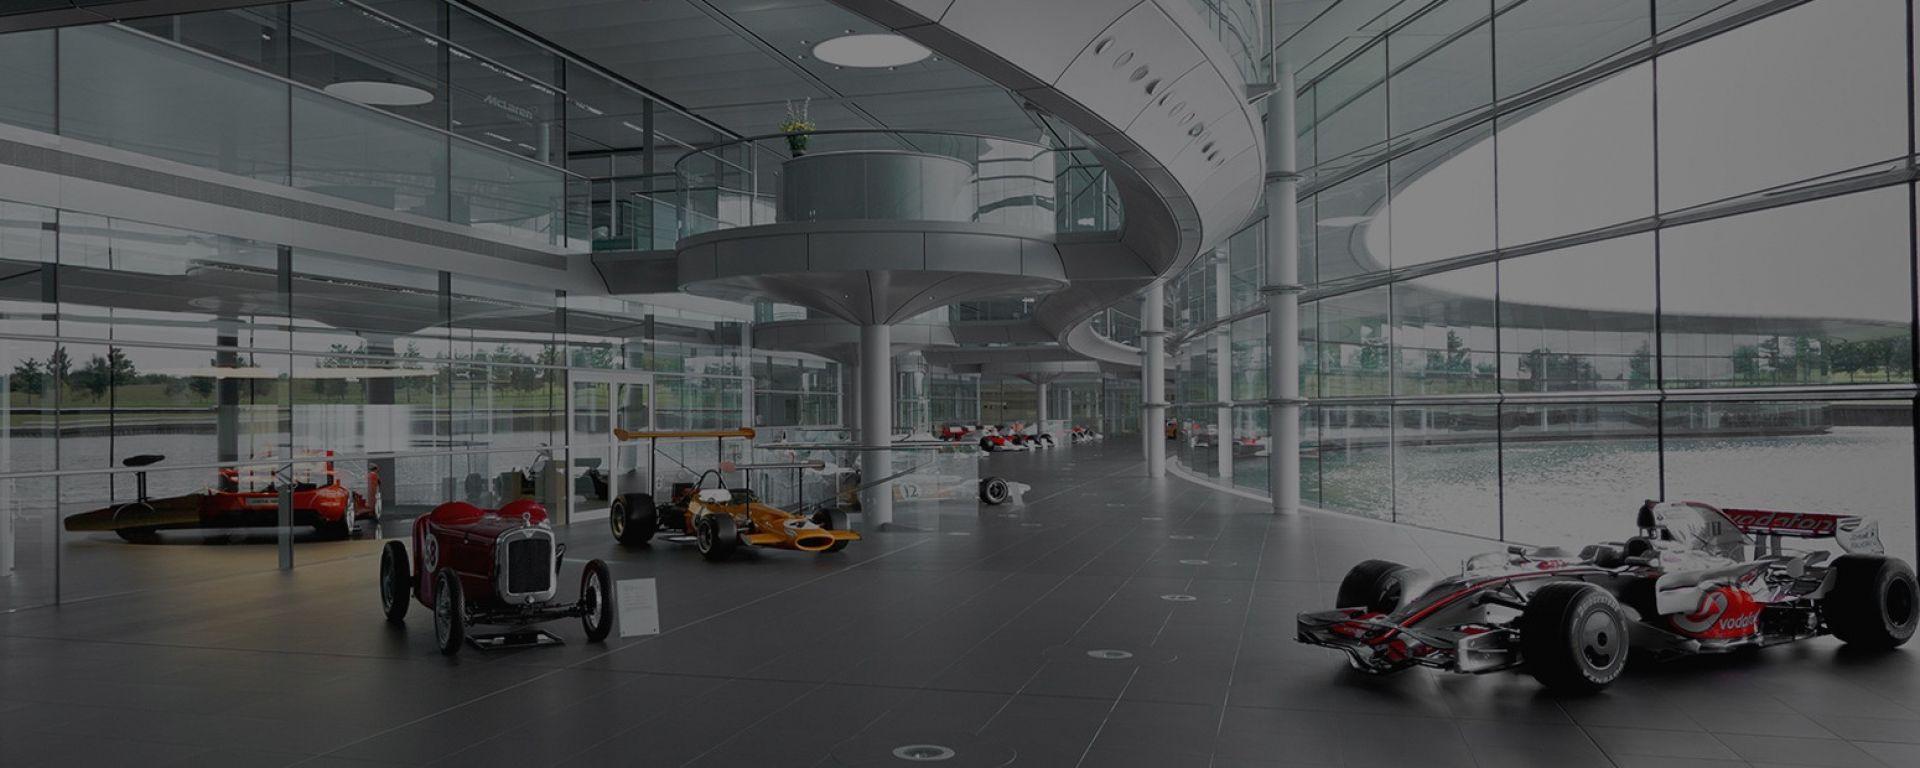 McLaren Technology Centre, Woking, Regno Unito